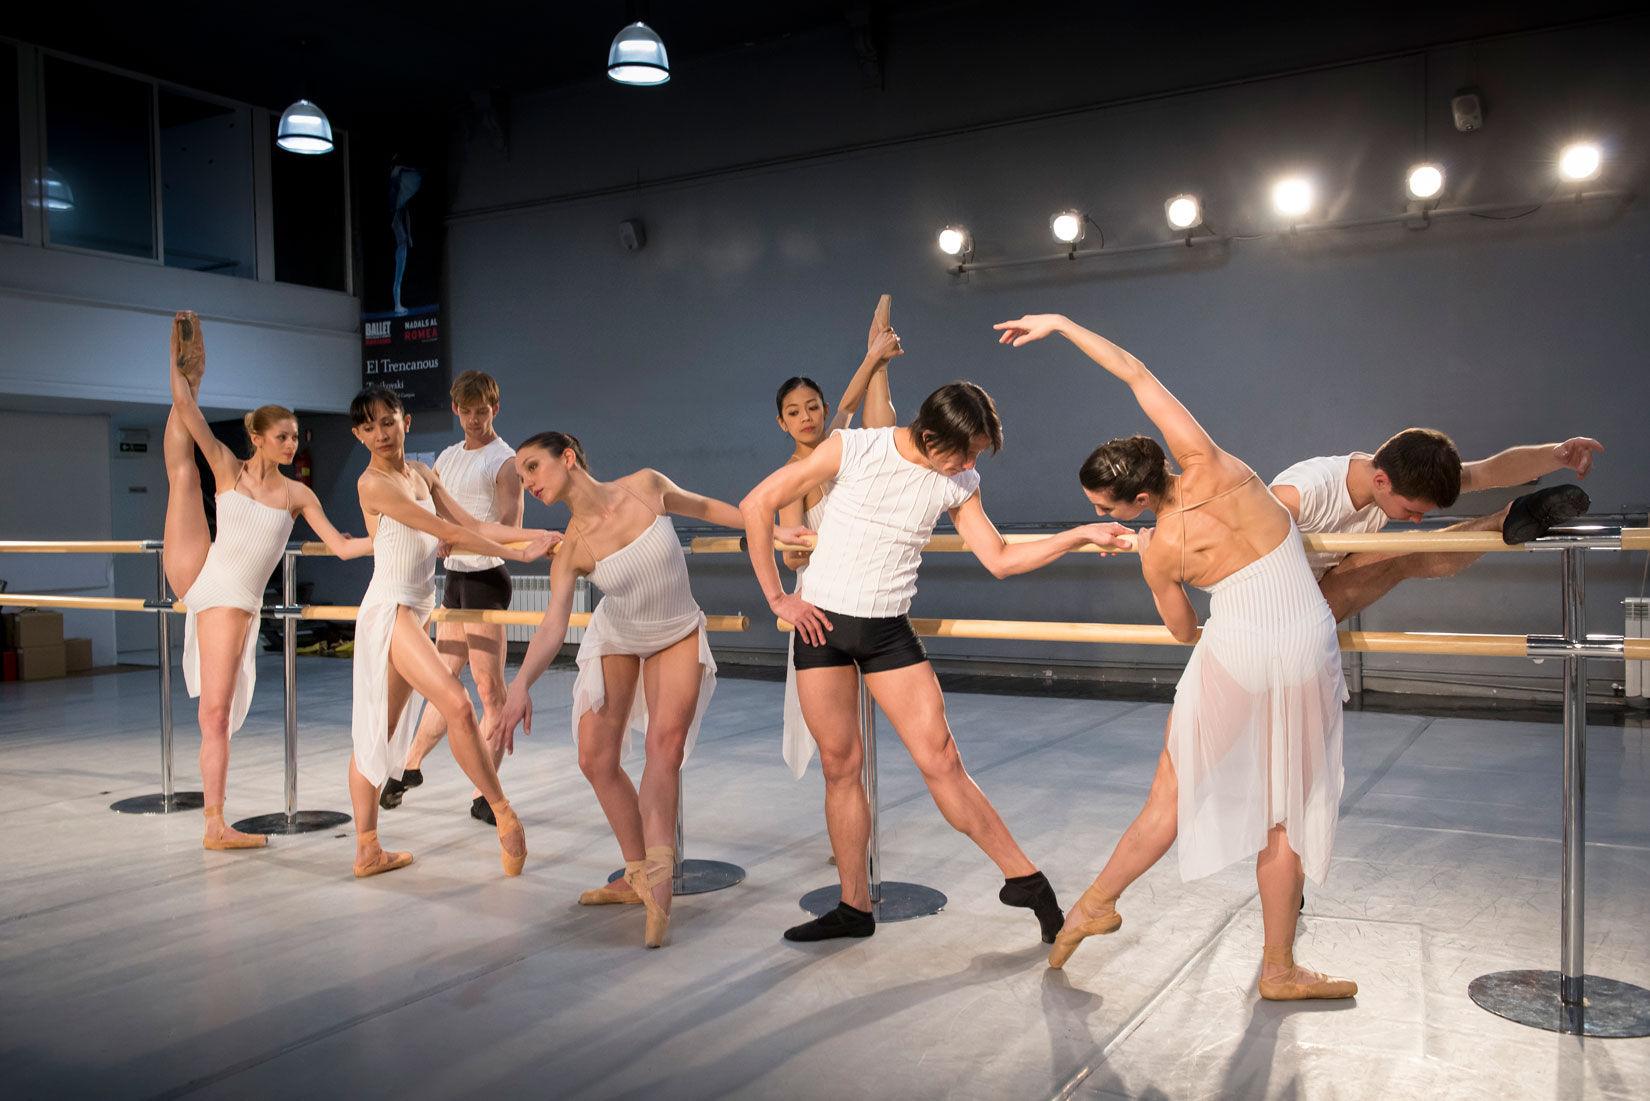 Foto 3 de Escuelas de música, danza e interpretación en Barcelona | Escola de Ballet Clàssic David Campos